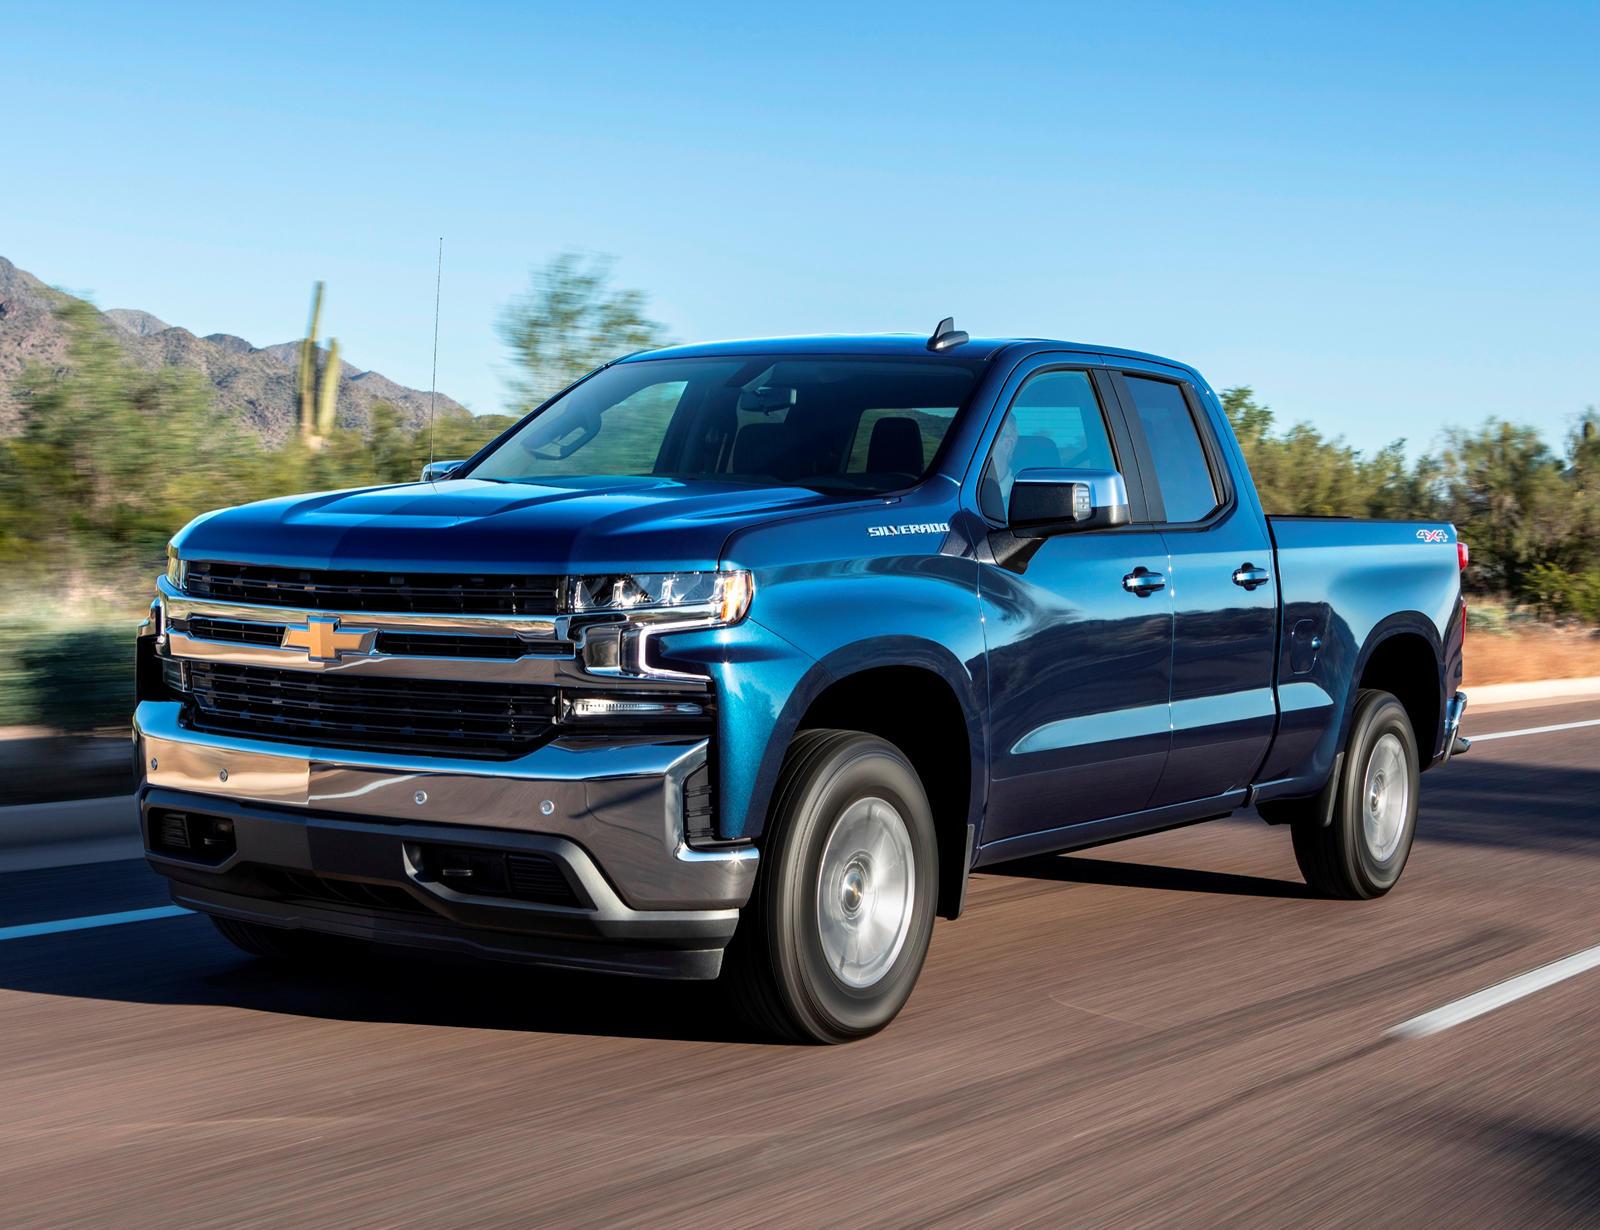 Chevrolet s Four Cylinder Silverado Engine Has Better Fuel Economy